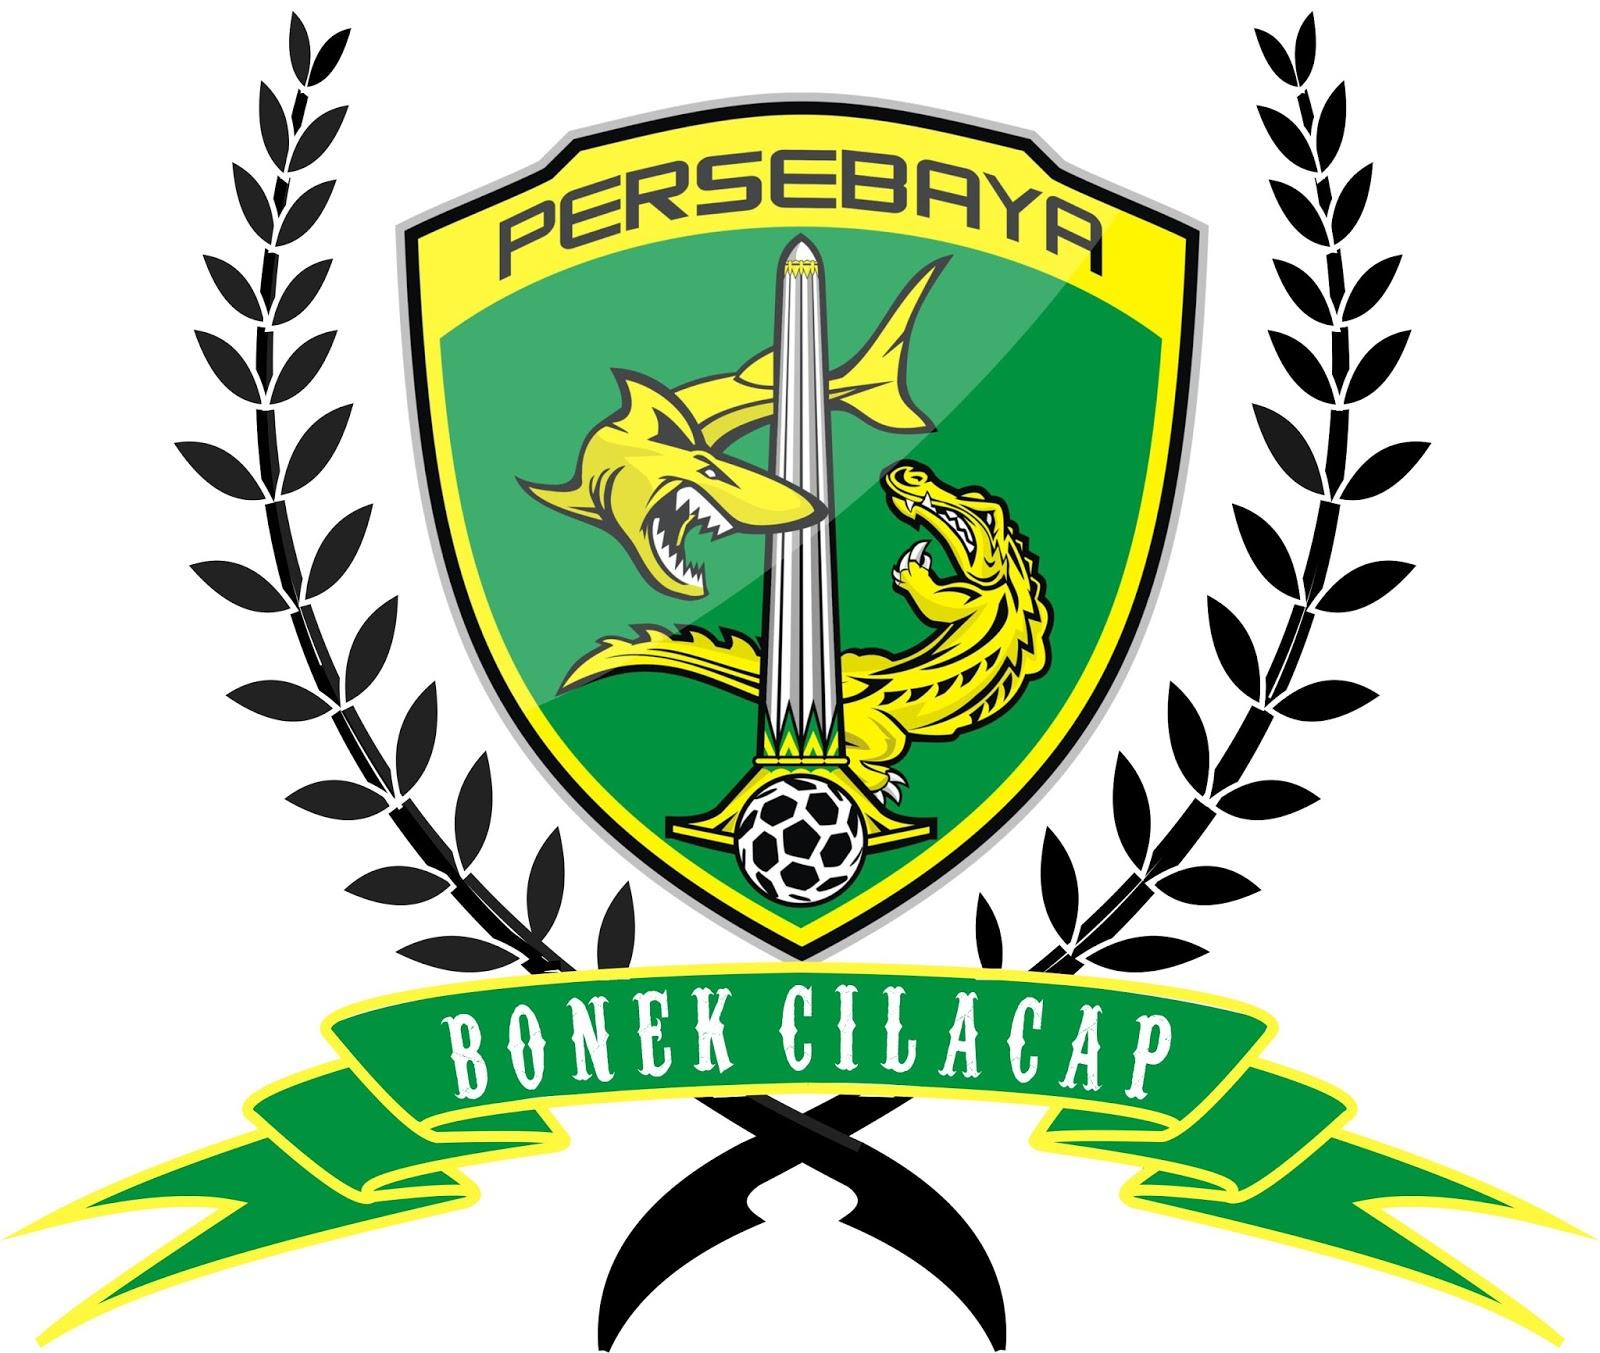 Design Logo Bonek Cilacap Aditya Art Gambar Persebaya